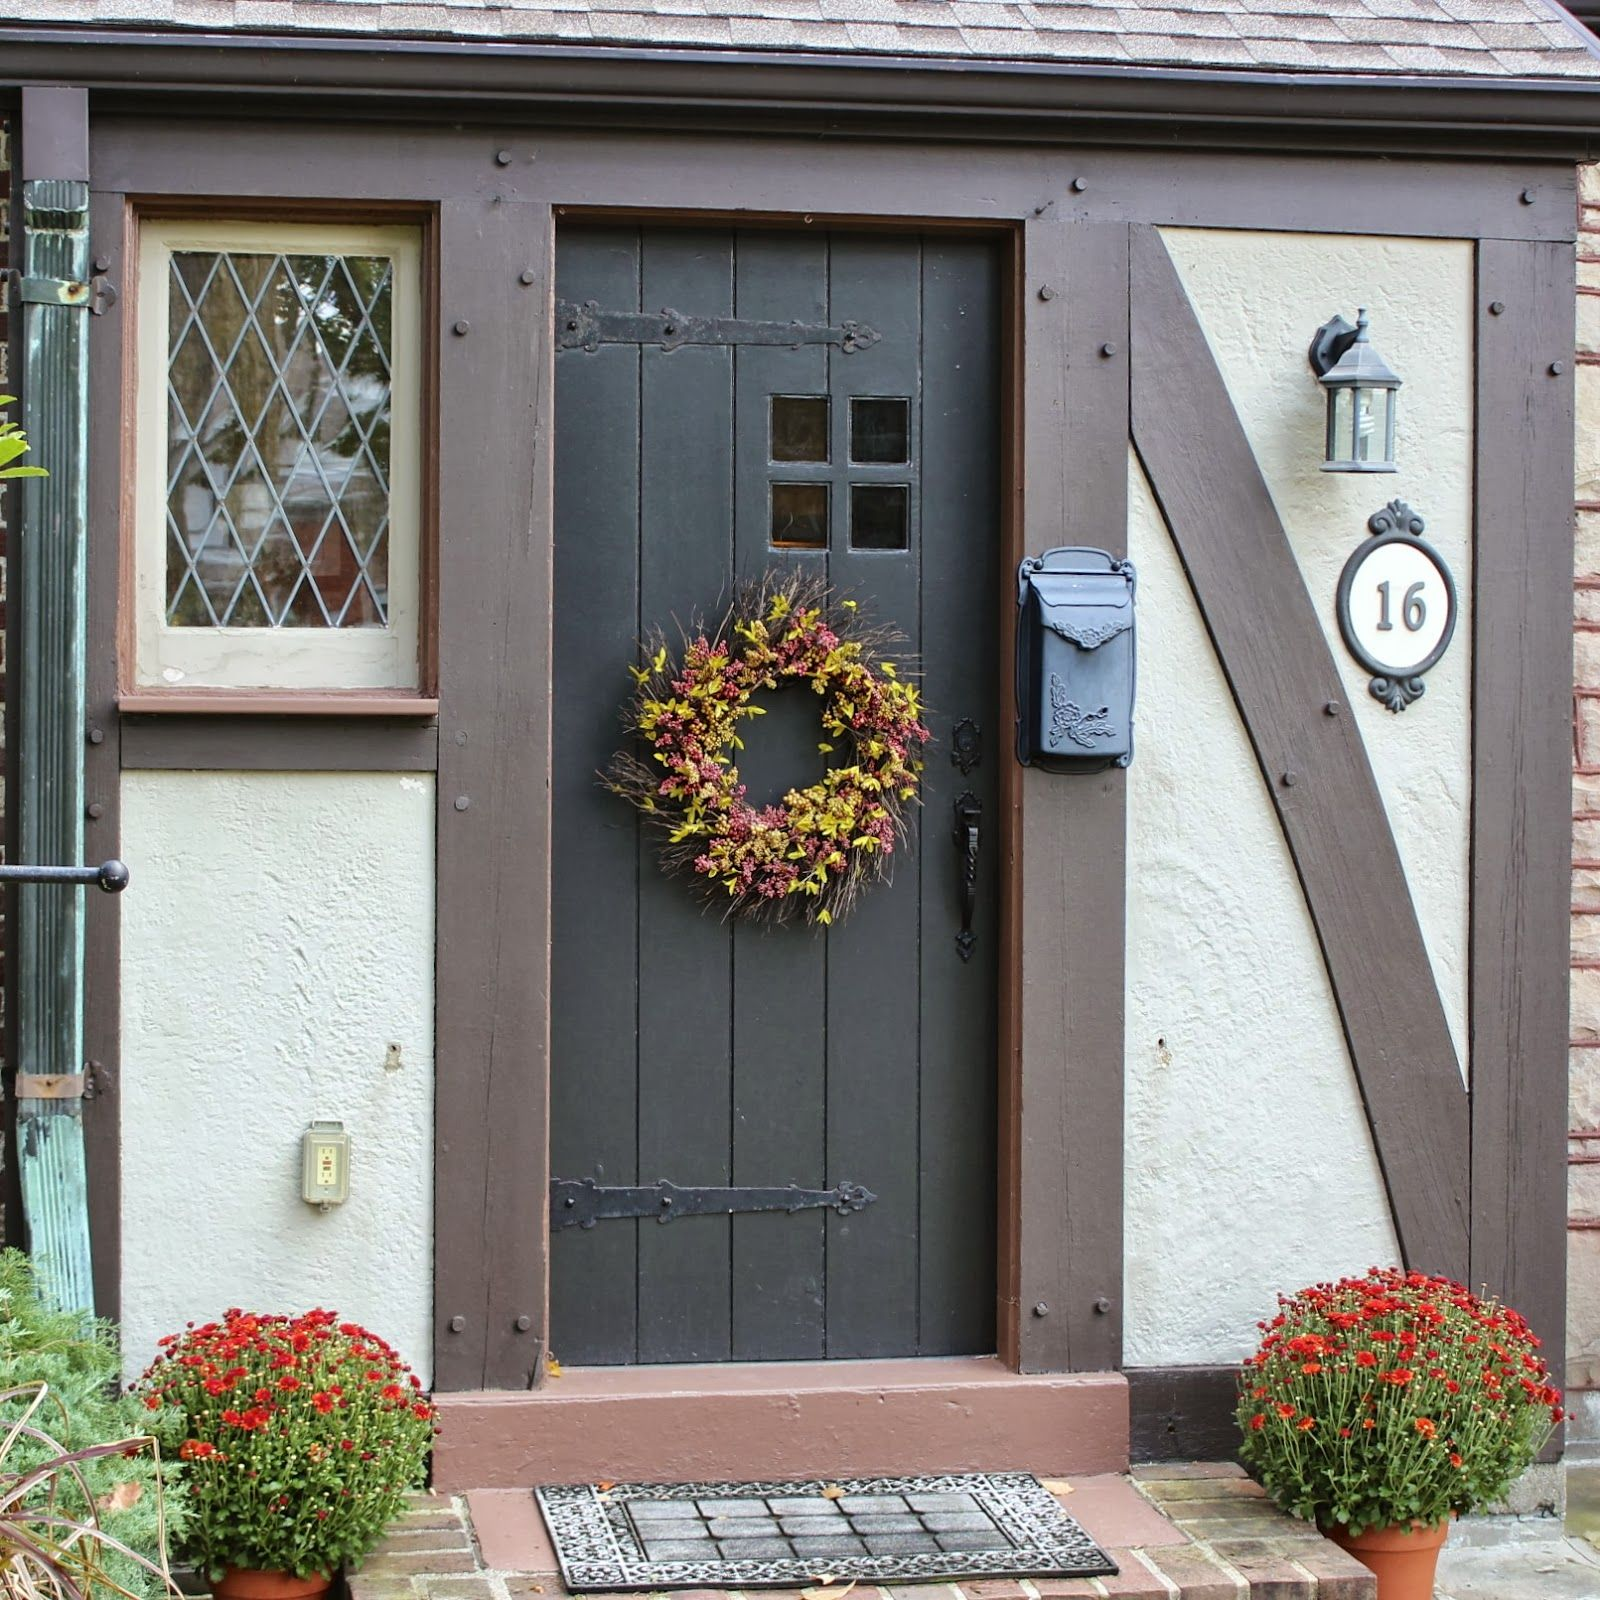 Image result for tudor home front door colors & Image result for tudor home front door colors | house | Pinterest ... pezcame.com